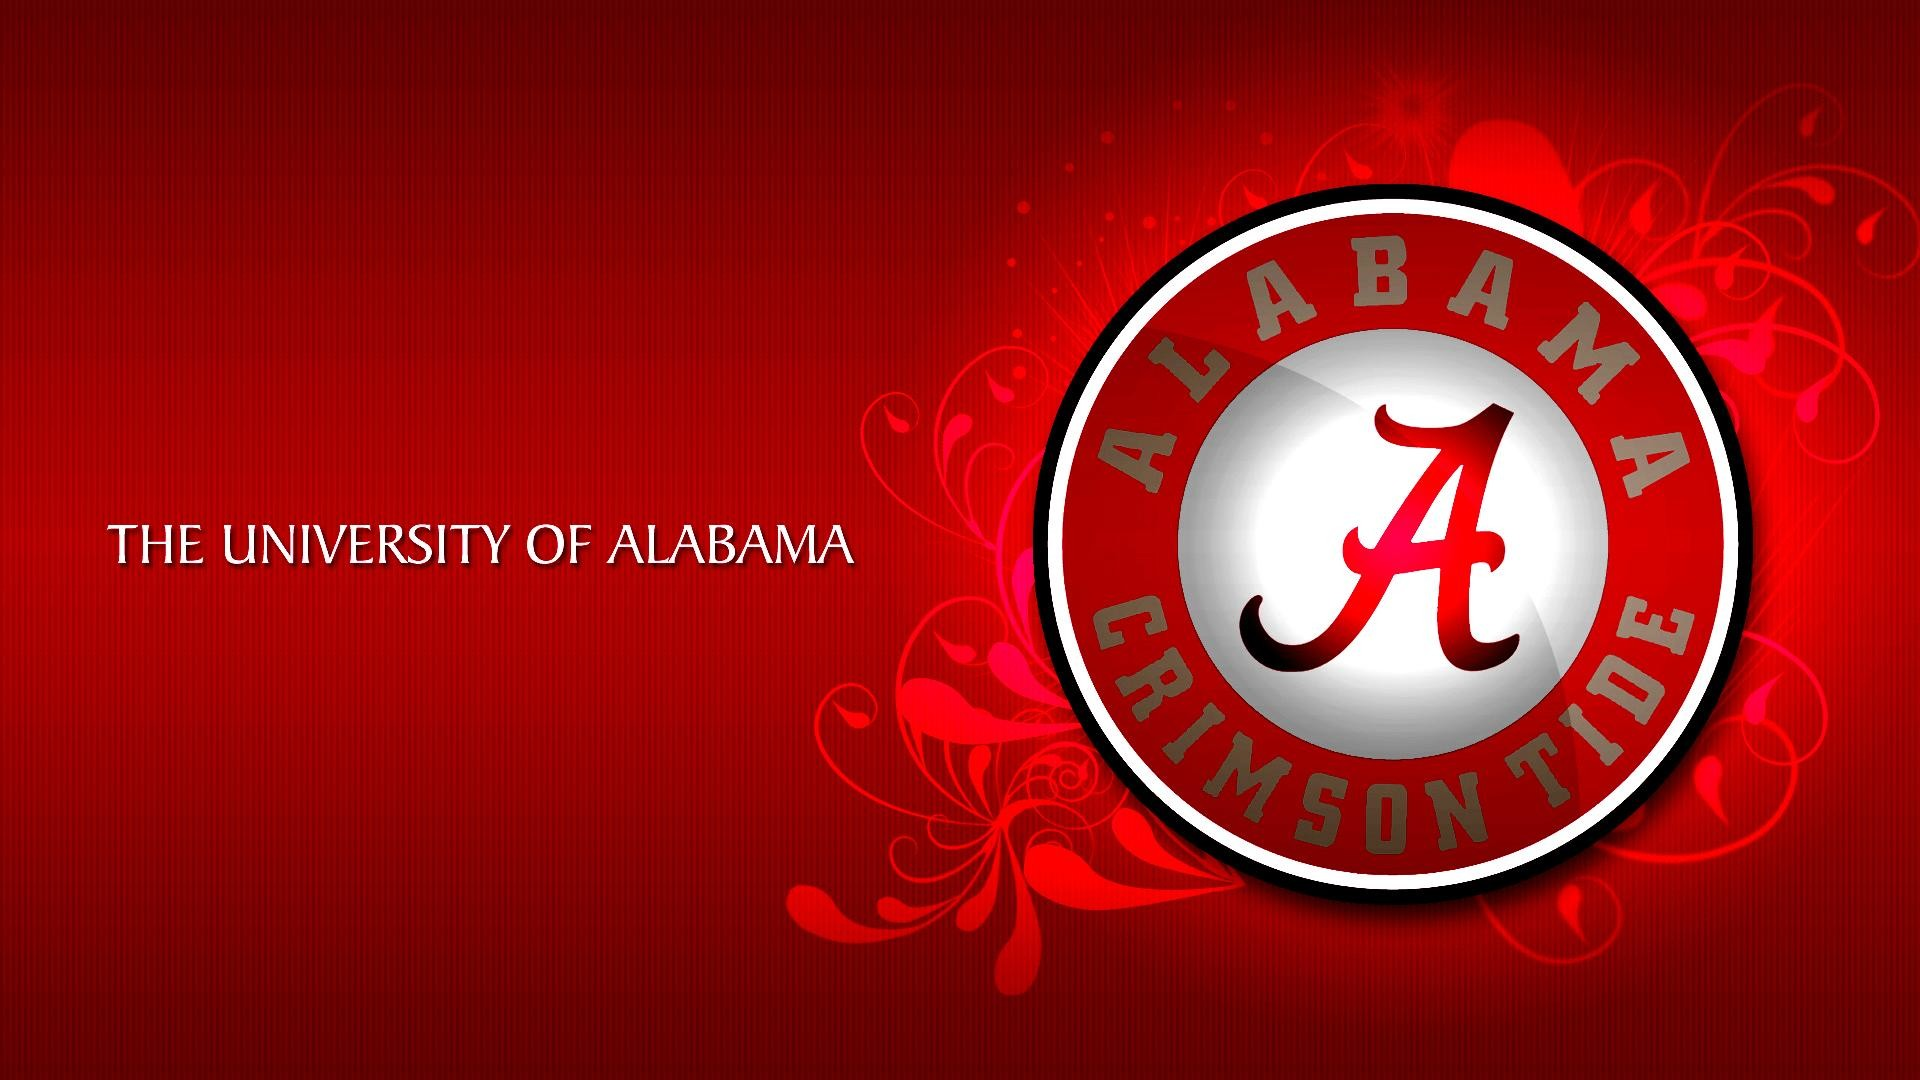 University of alabama wallpapers 55 images - Alabama backgrounds ...